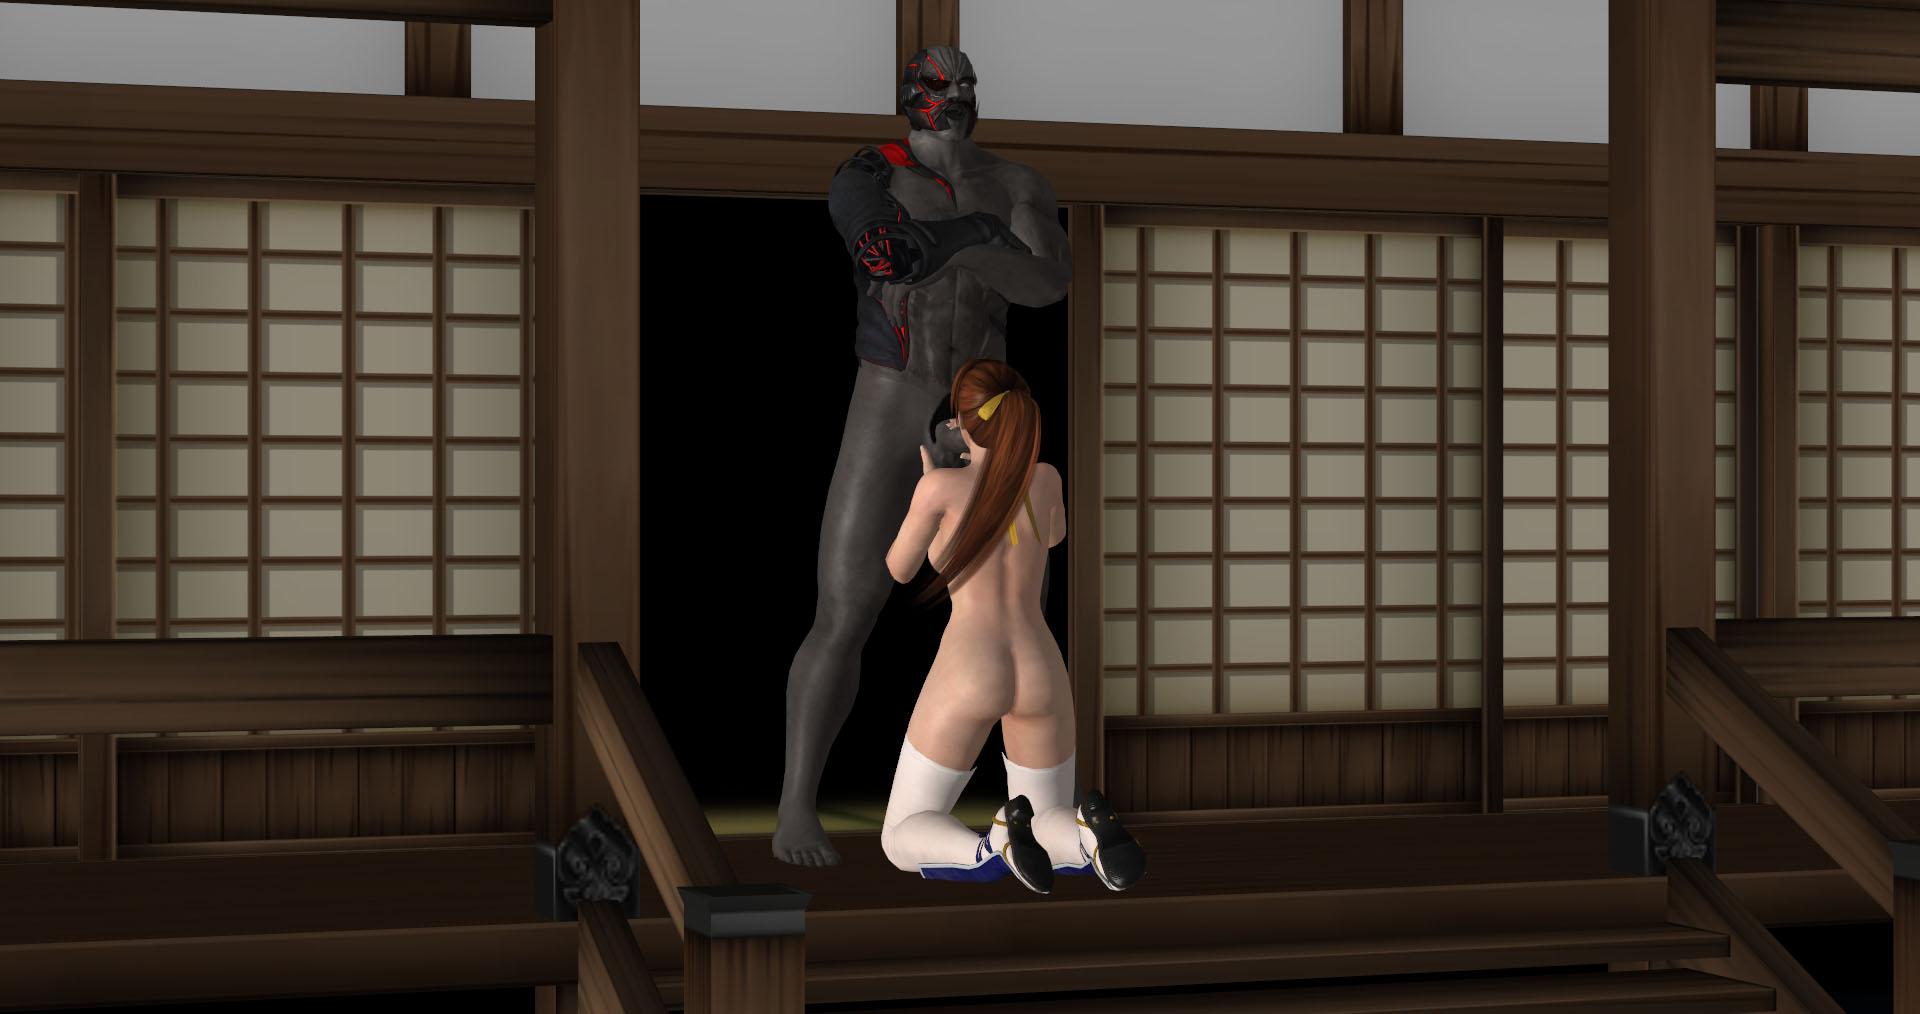 raidou_raping_kunoichi_0023_layer_34_by_bitemonsters-dbgv5je.jpg